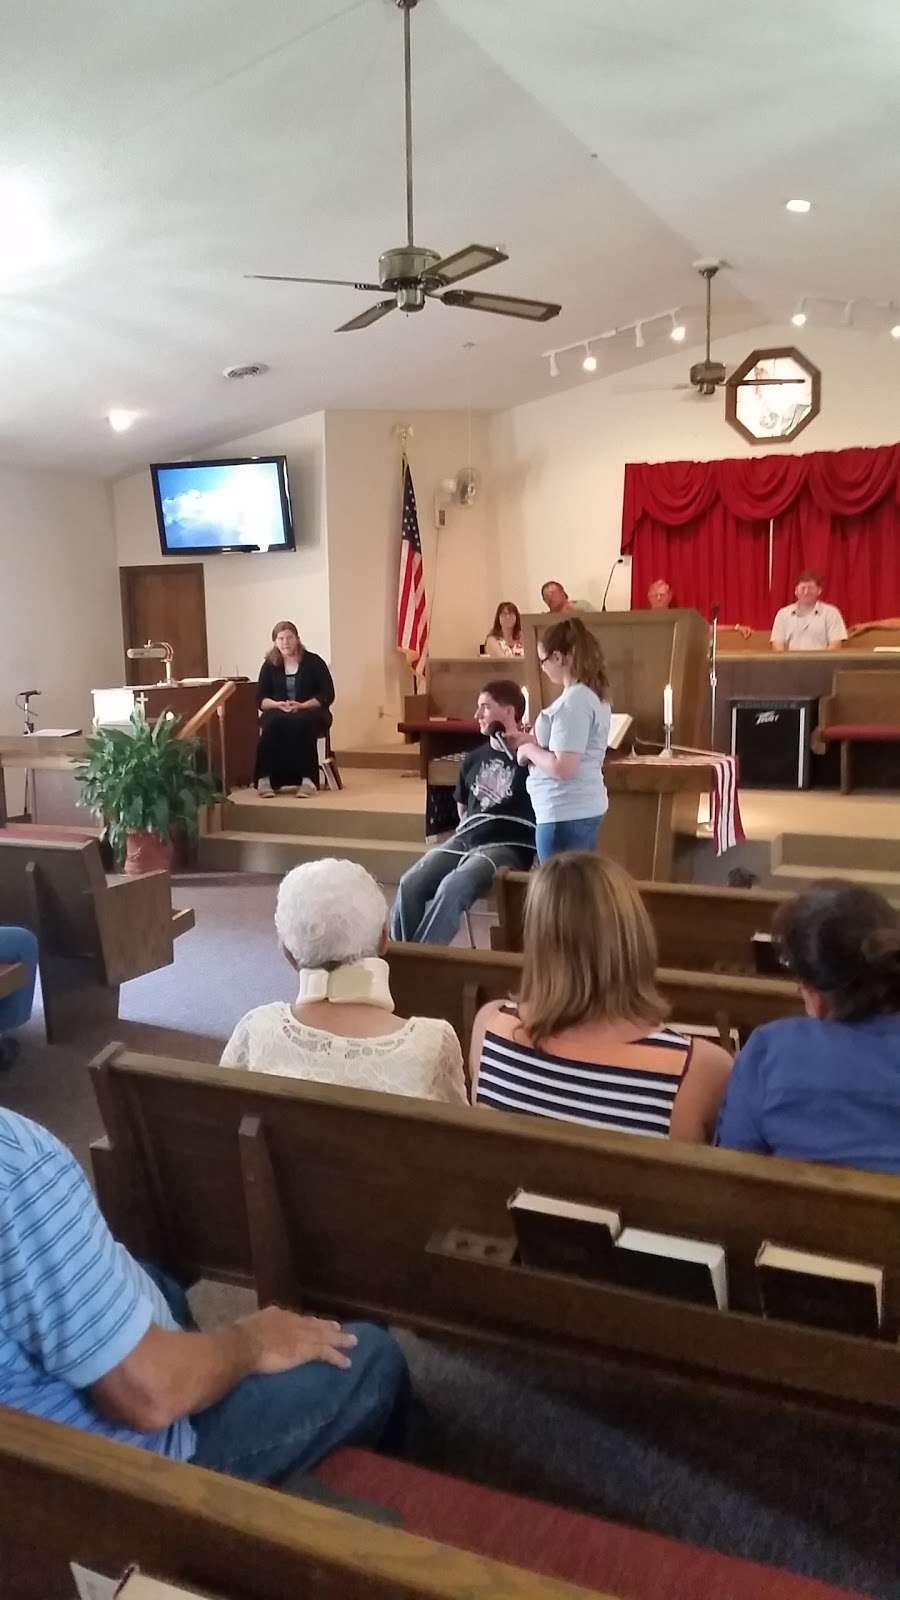 Lake Viking Church - church  | Photo 3 of 4 | Address: 18842 Otter Ave, Gallatin, MO 64640, USA | Phone: (660) 663-3914